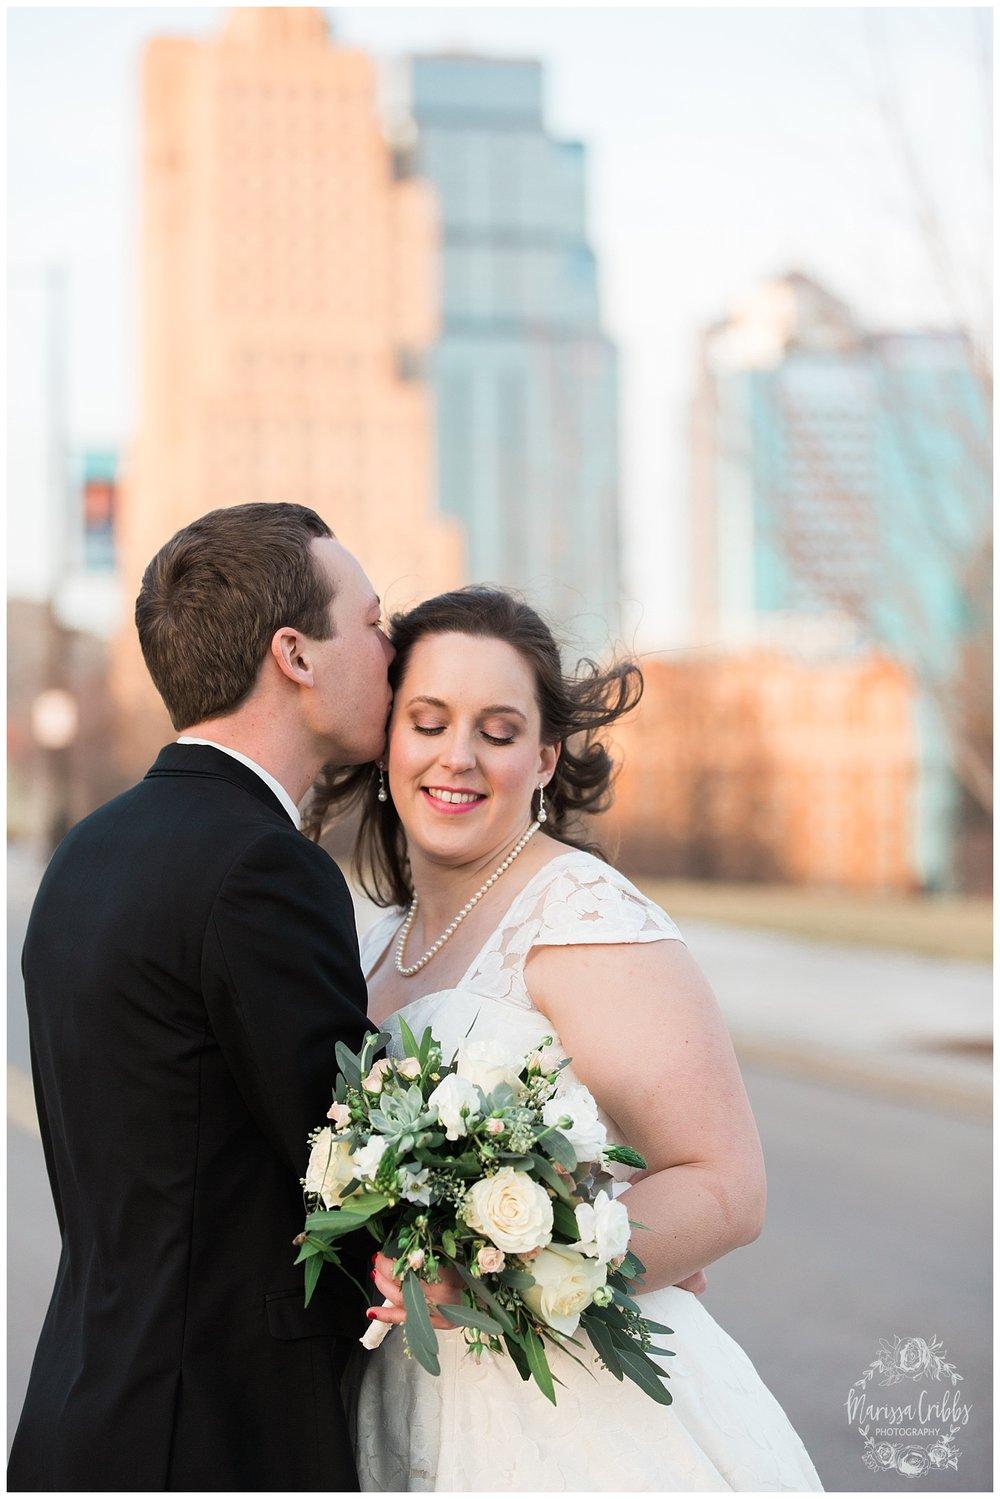 Webster House KC Wedding | KC Wedding Photographer | Marissa Cribbs Photography_0076.jpg